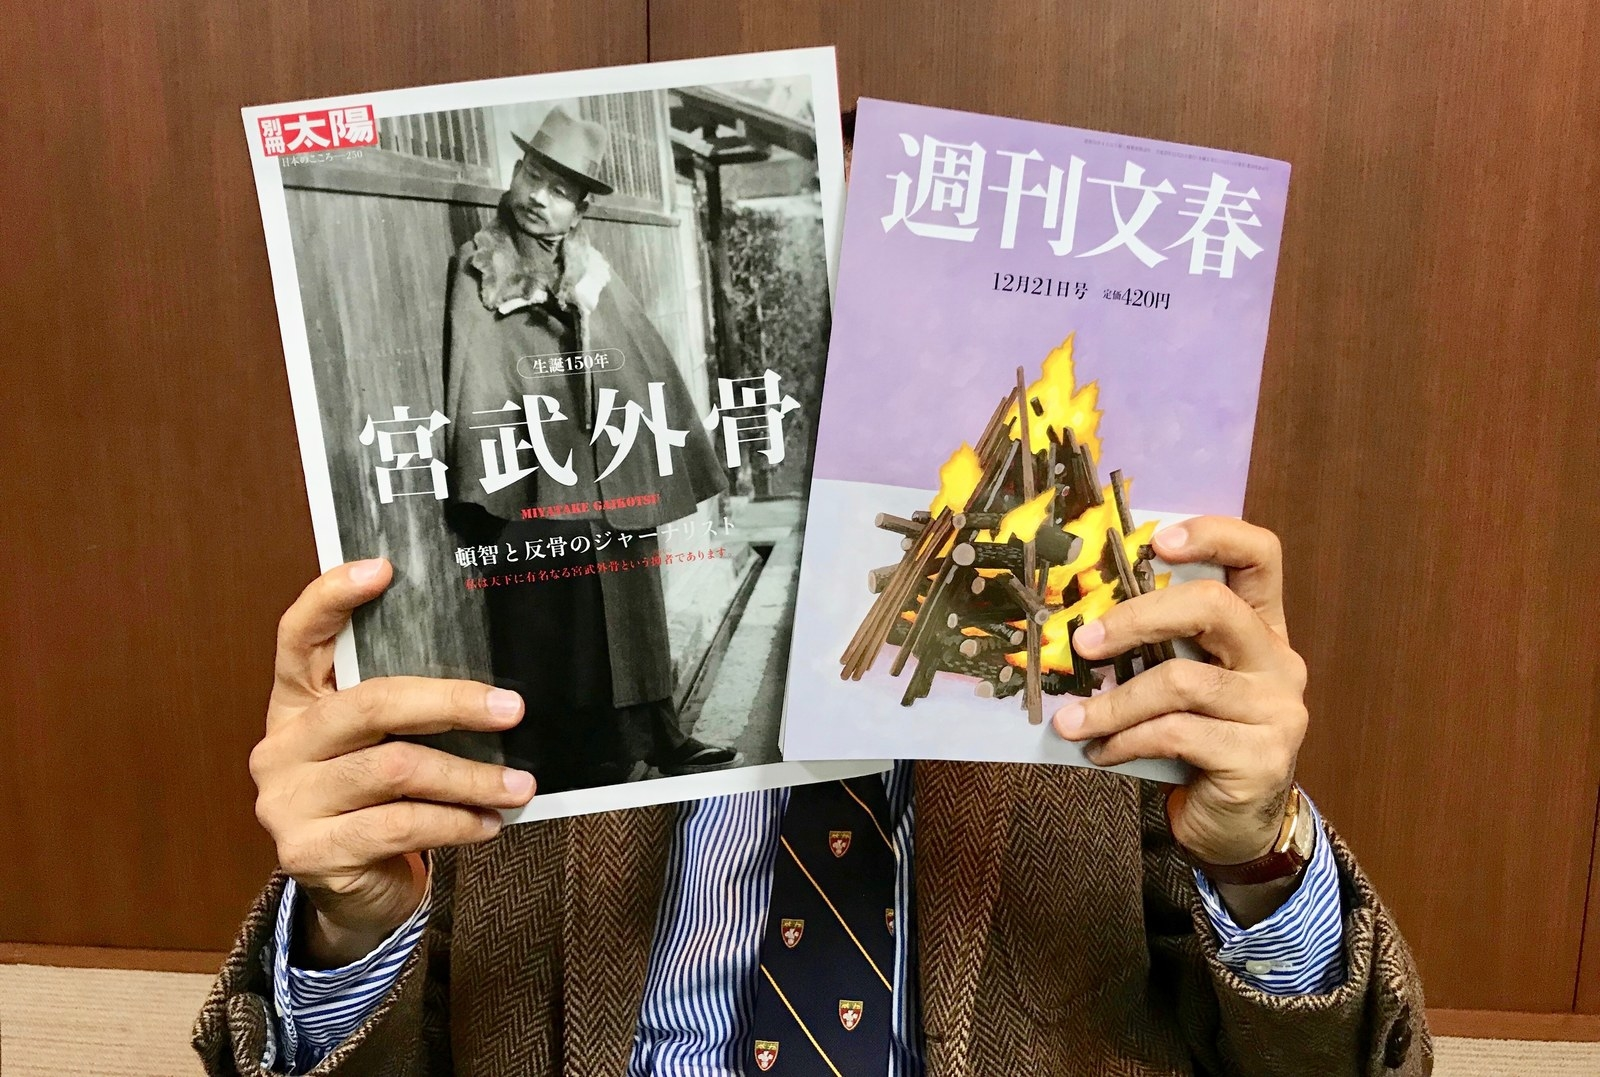 中 週刊 吊り 文春